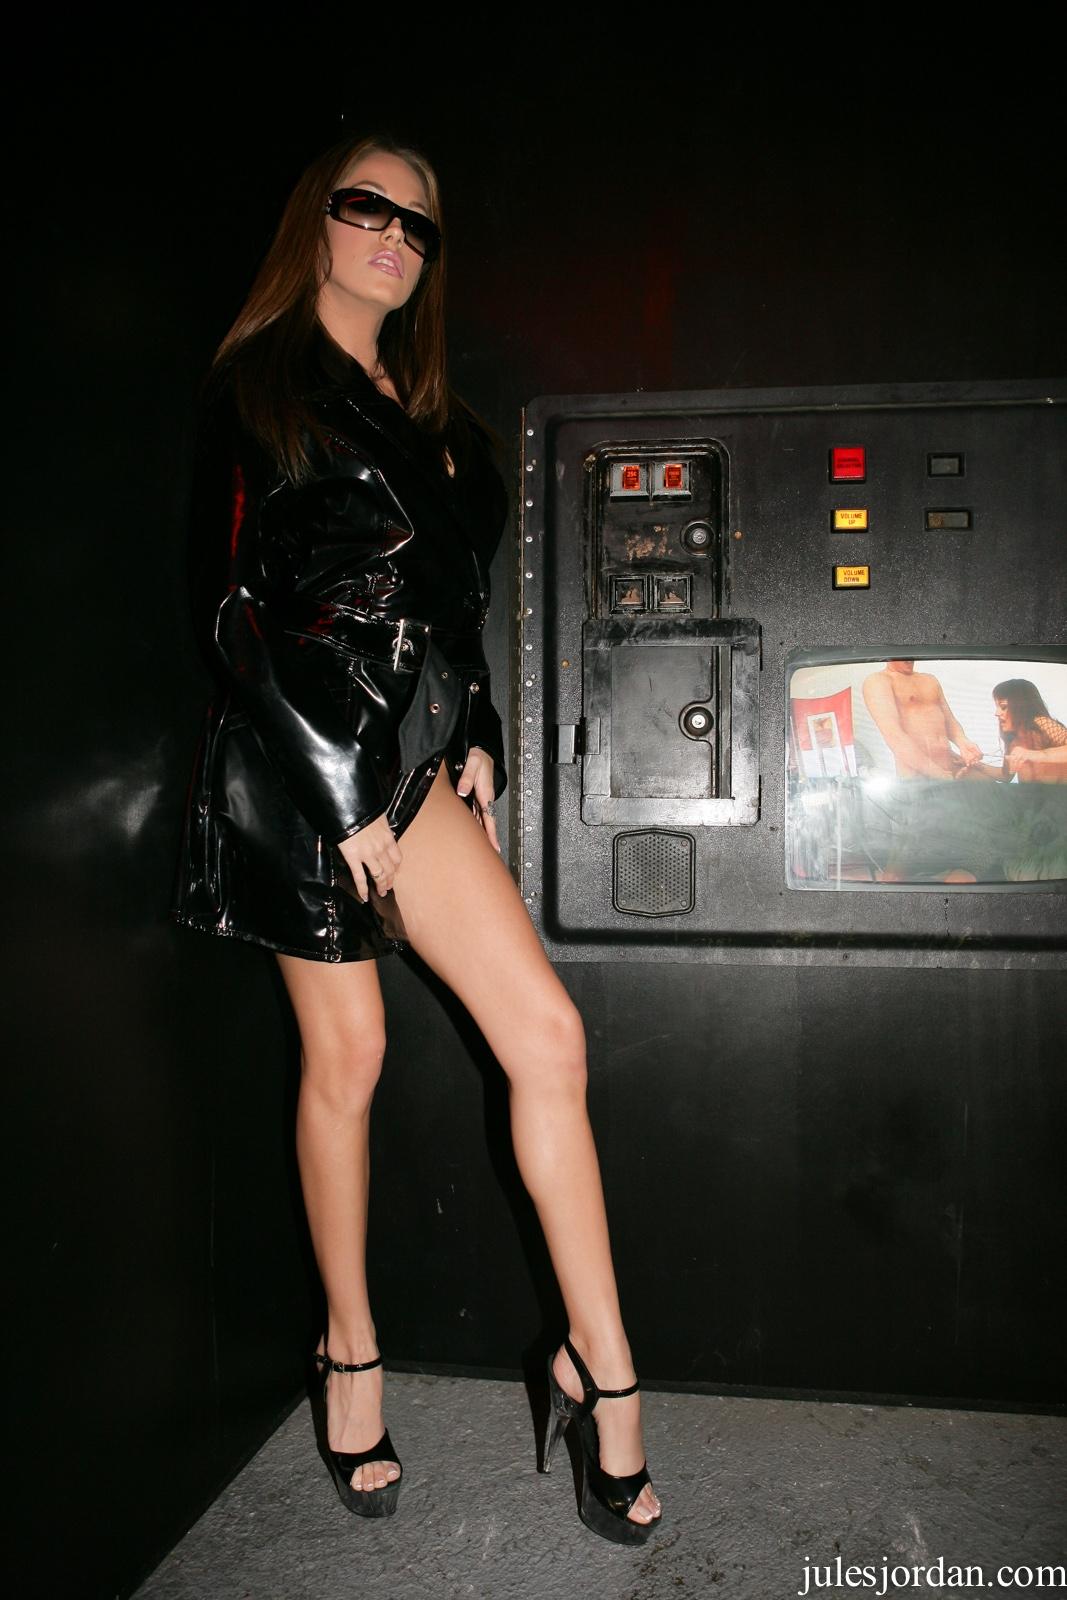 agujero de la gloria prostitutas economicas